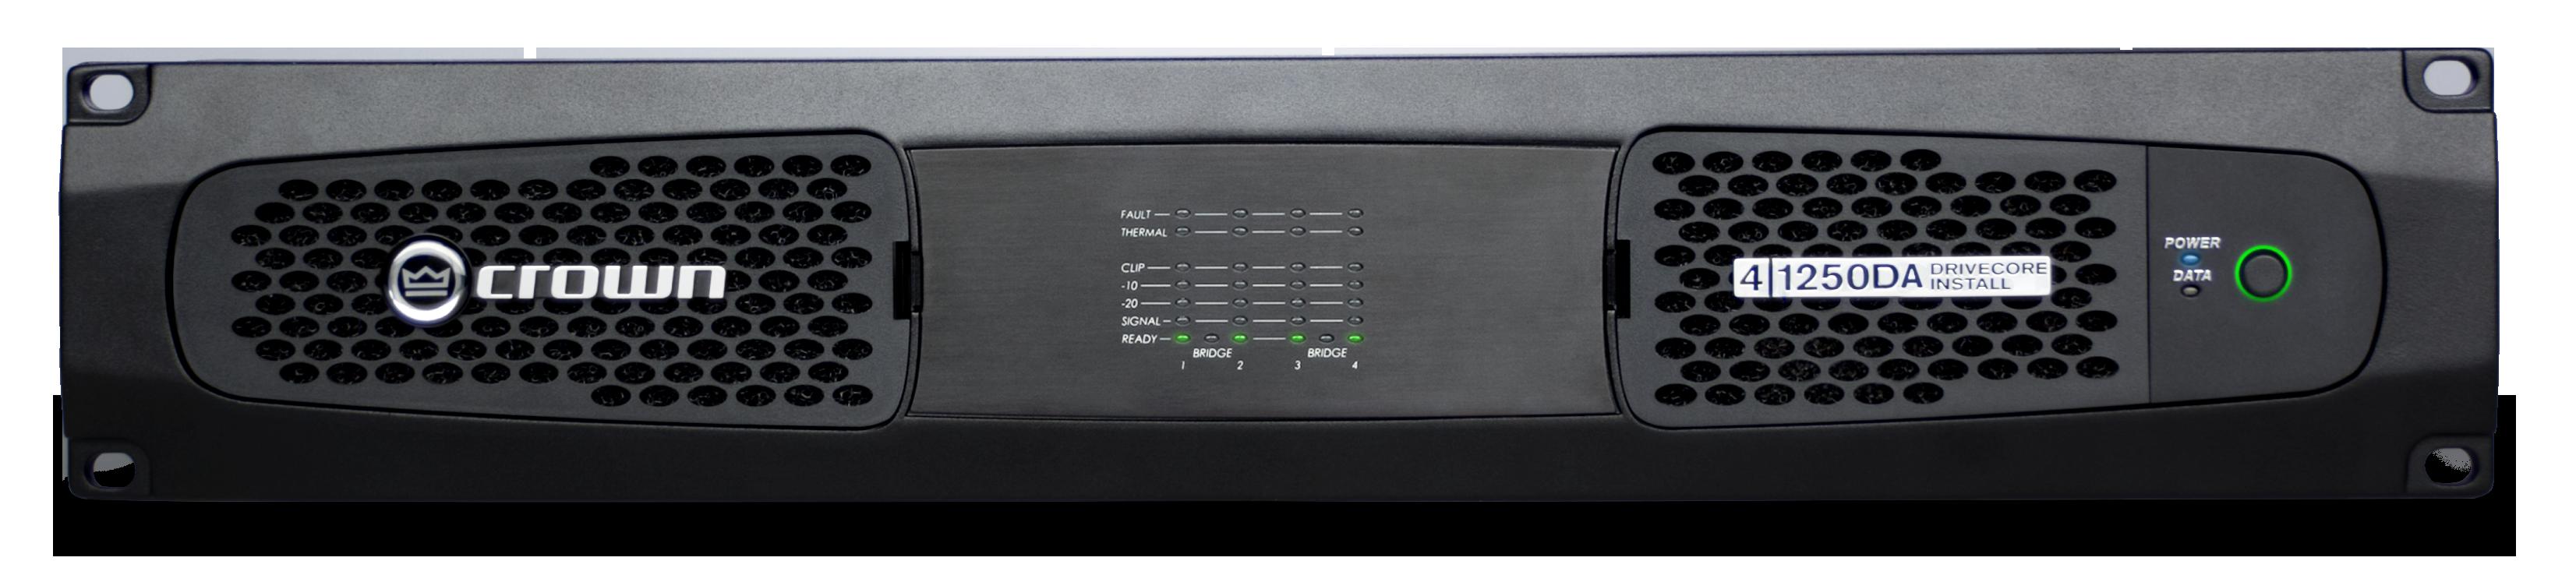 dci 4 1250da crown audio professional power amplifiers. Black Bedroom Furniture Sets. Home Design Ideas